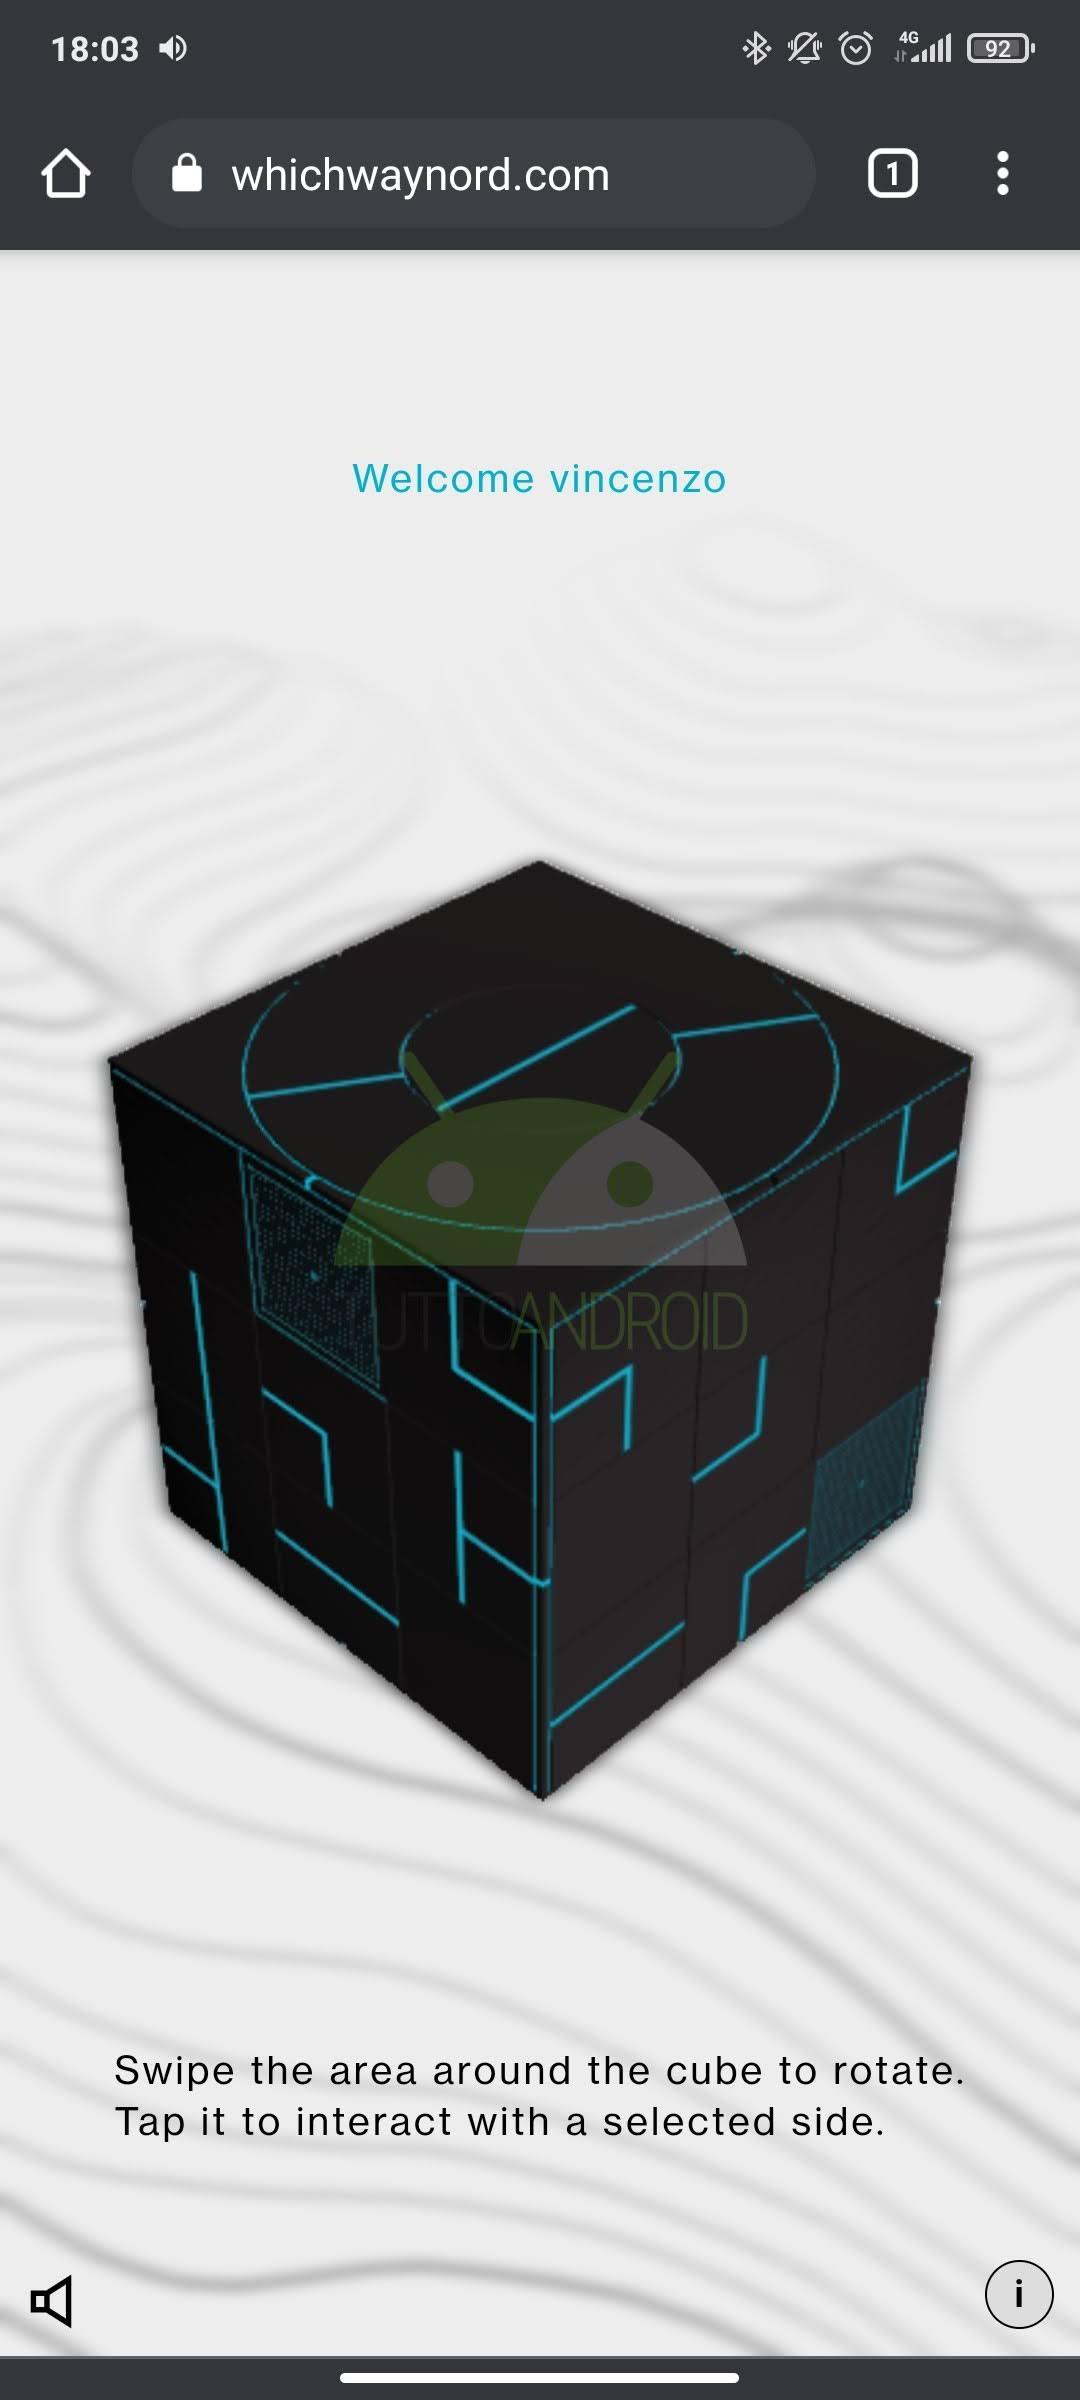 OnePlus Nord caccia al tesoro